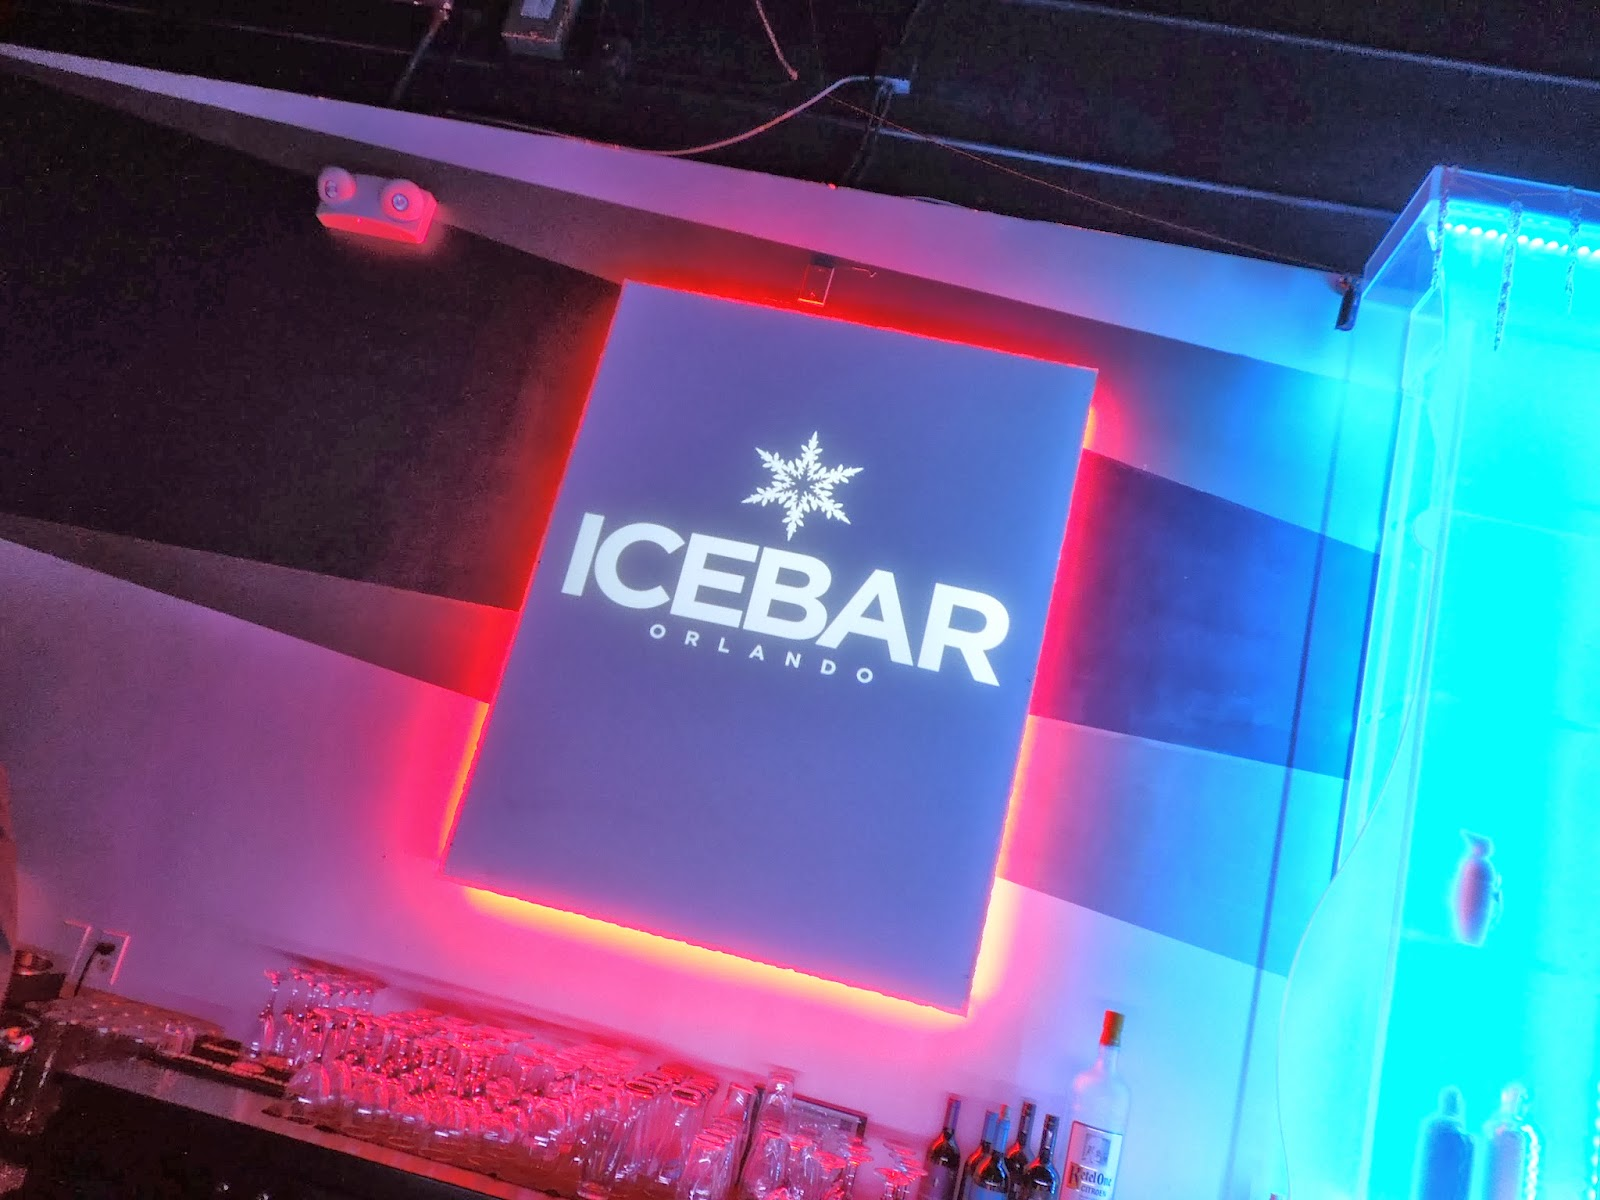 Icebar sign